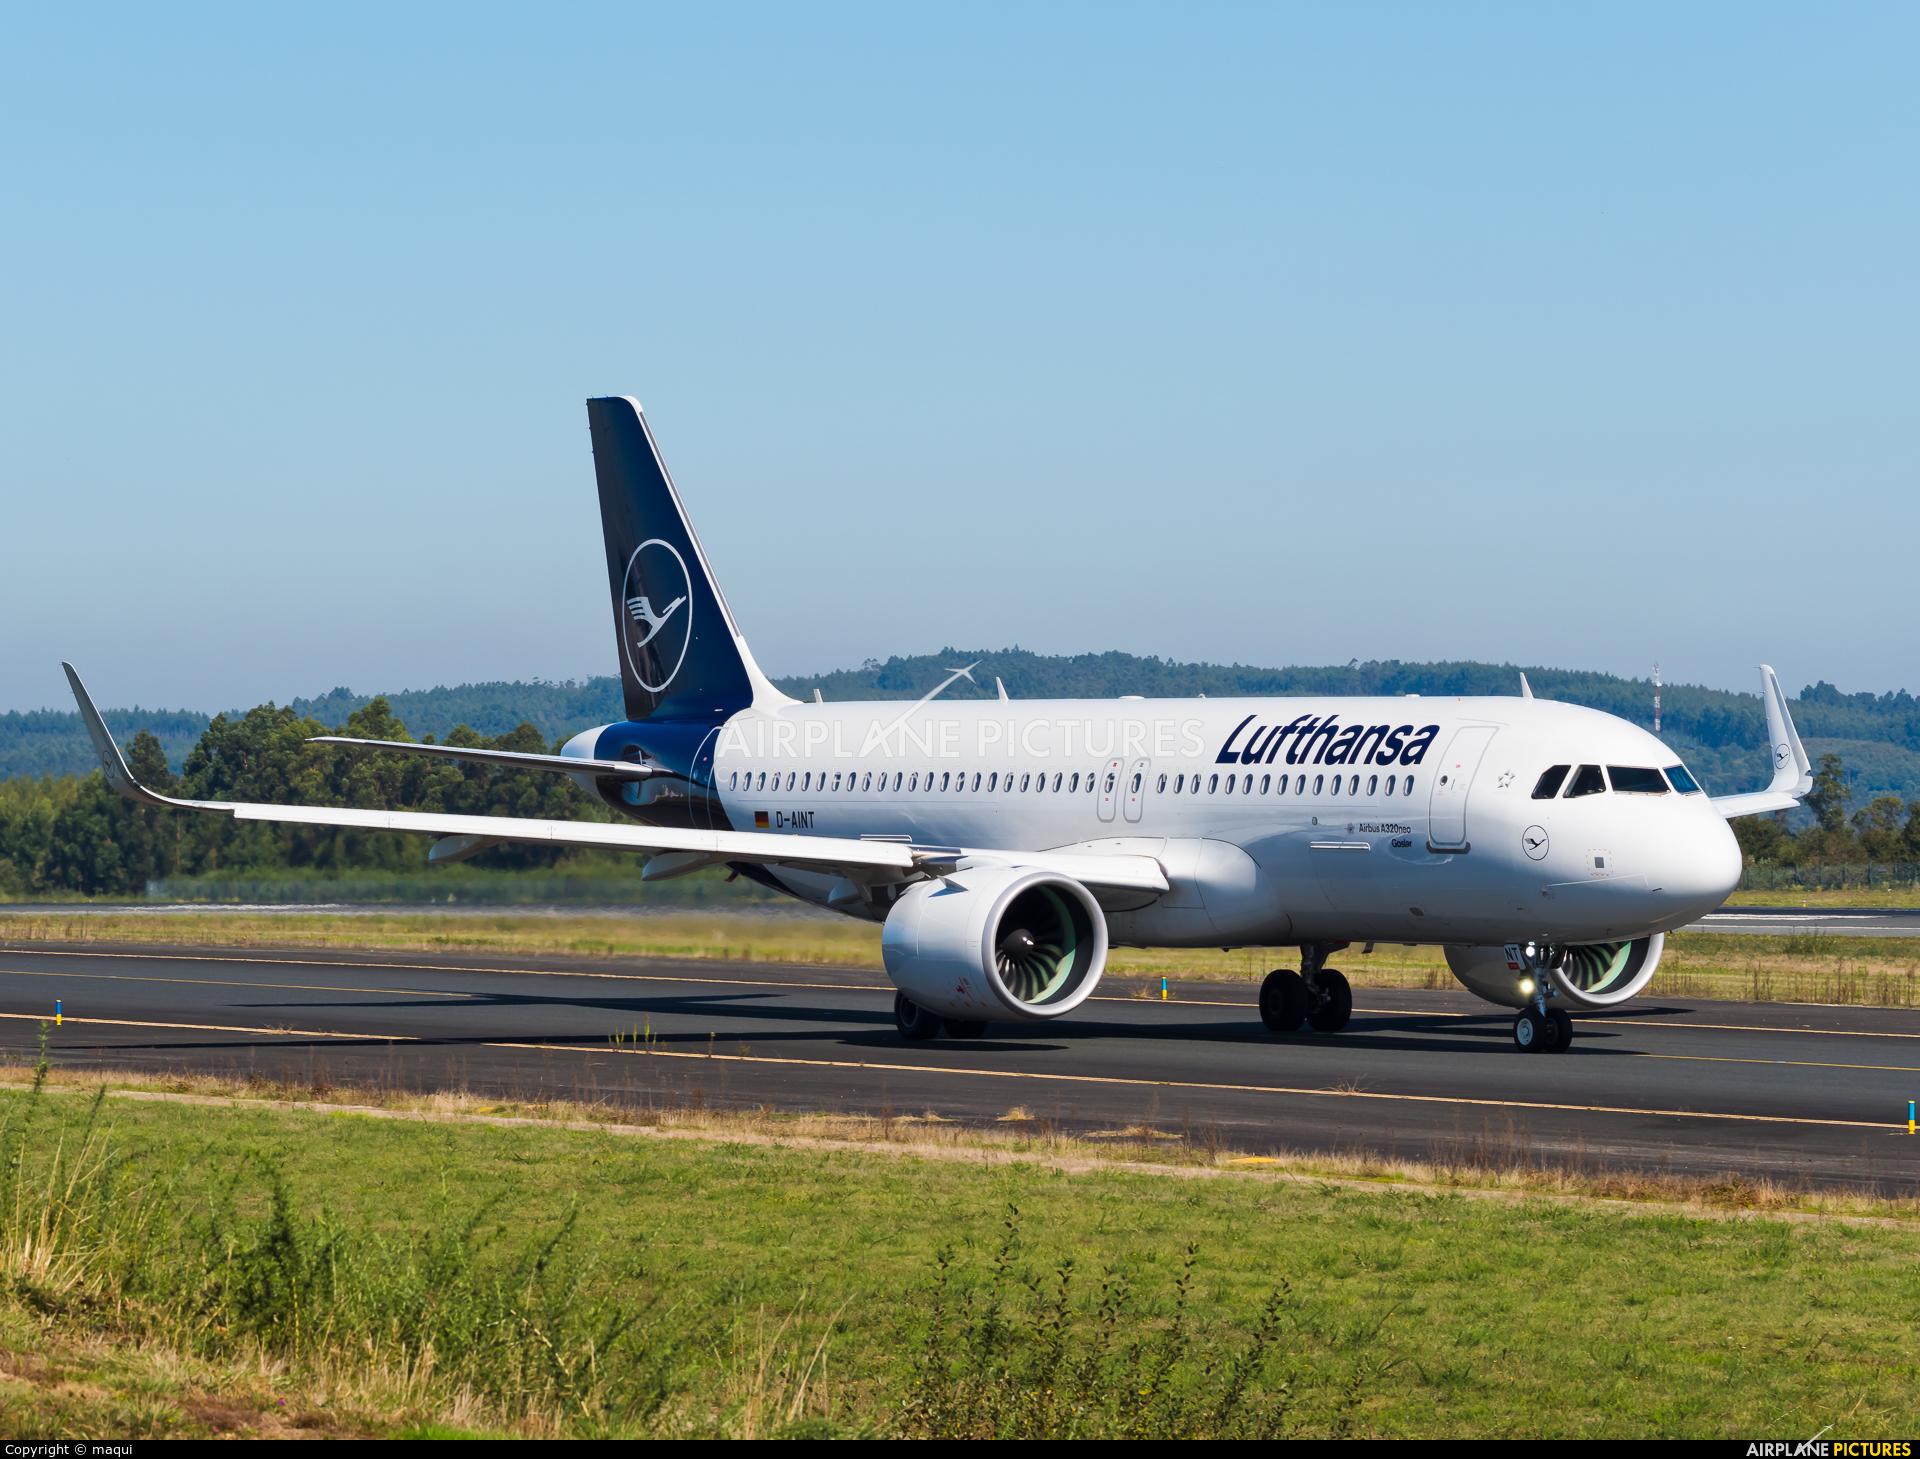 Lufthansa D-AINT aircraft at Santiago de Compostela